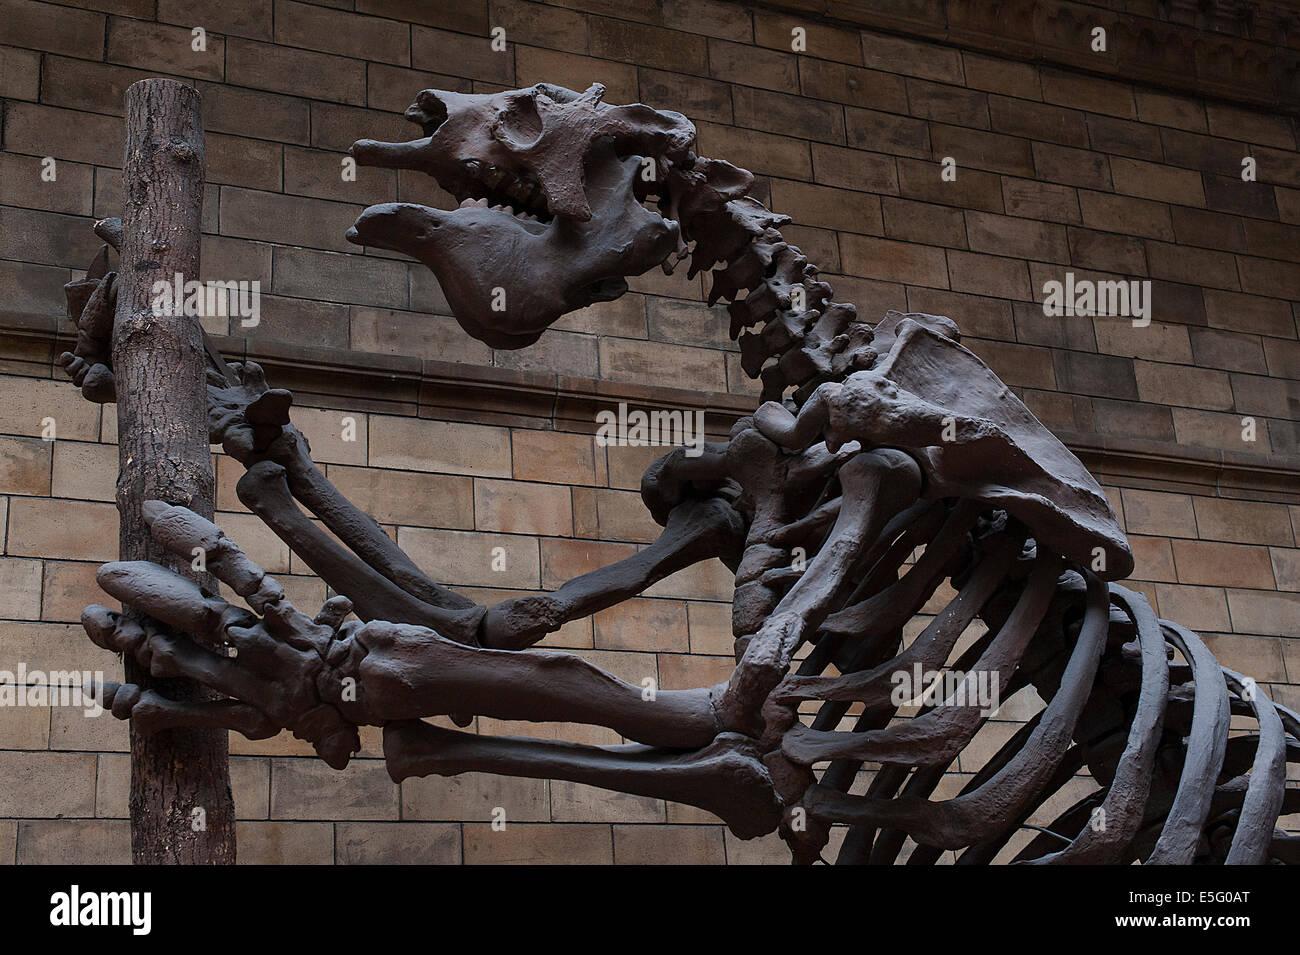 Giant ground sloth Megatherium americanum, mammal extinct - Stock Image